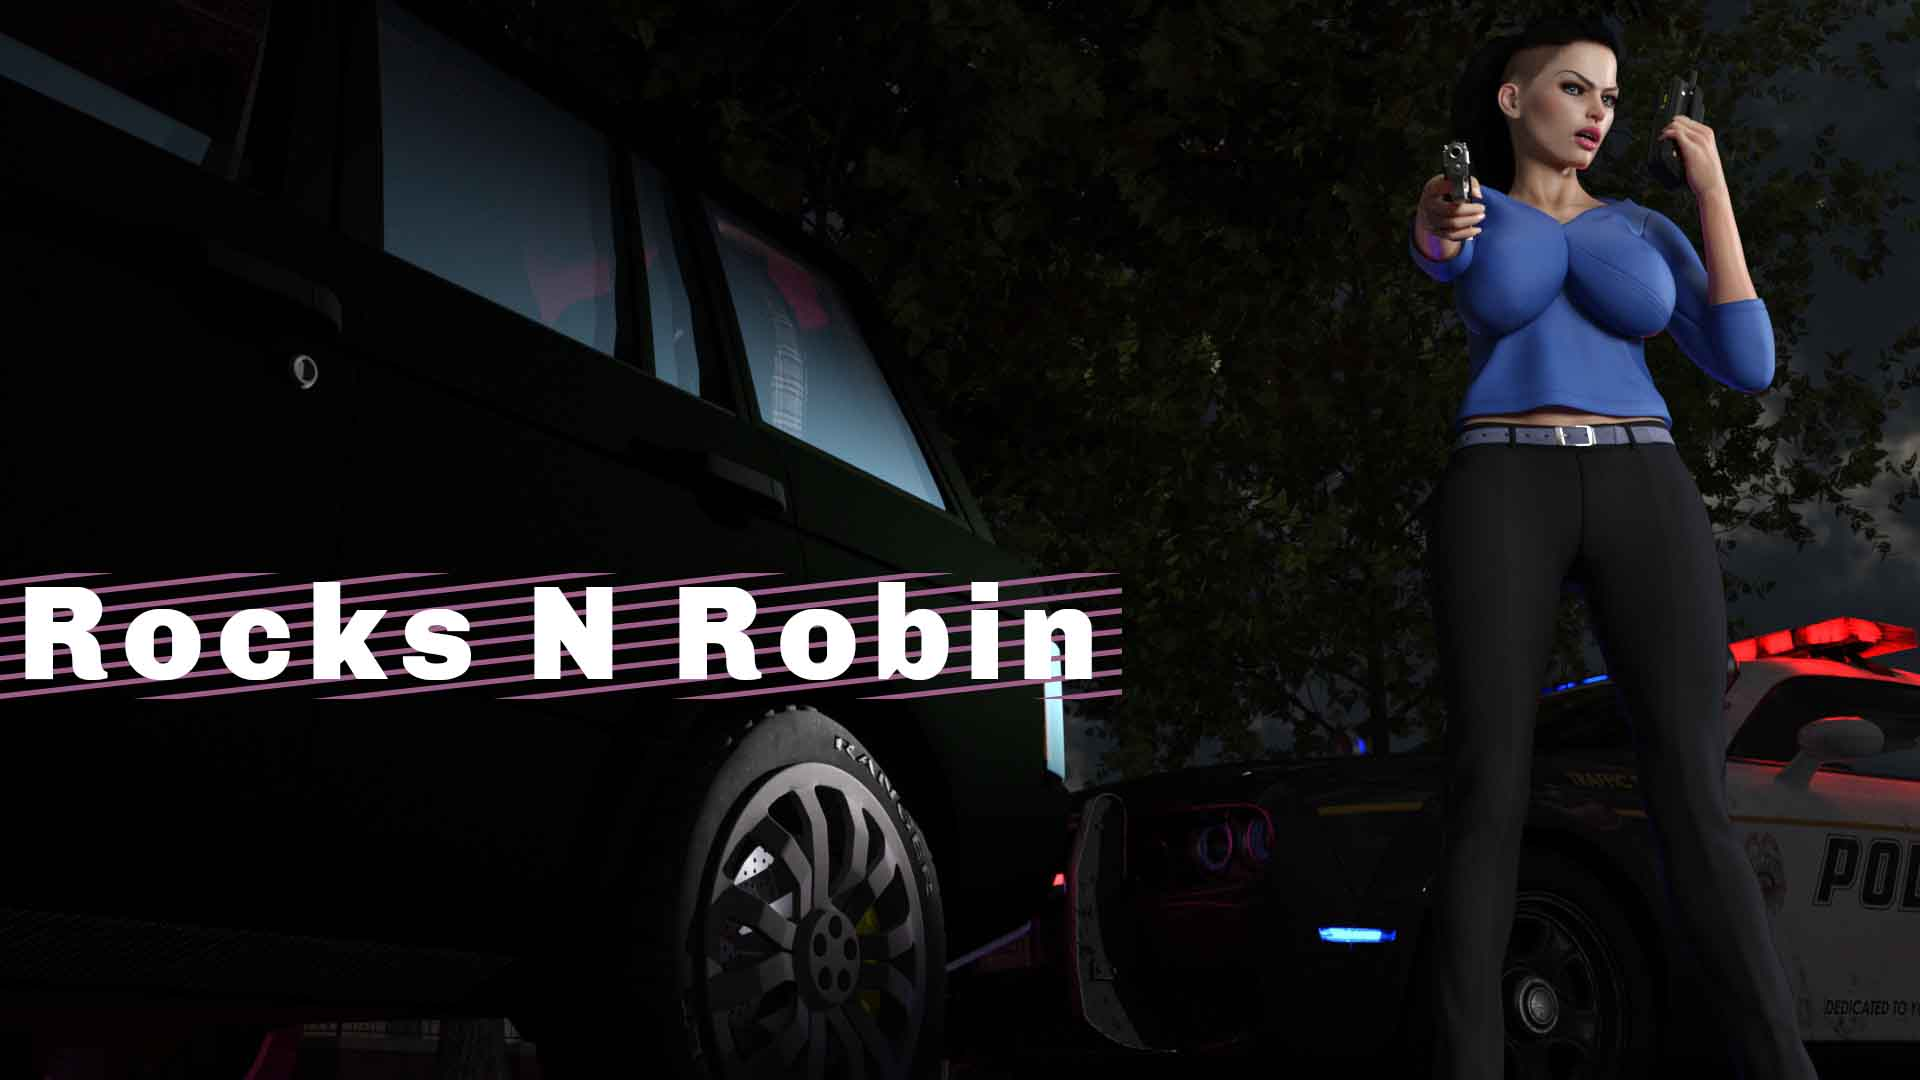 Rocks N Robin